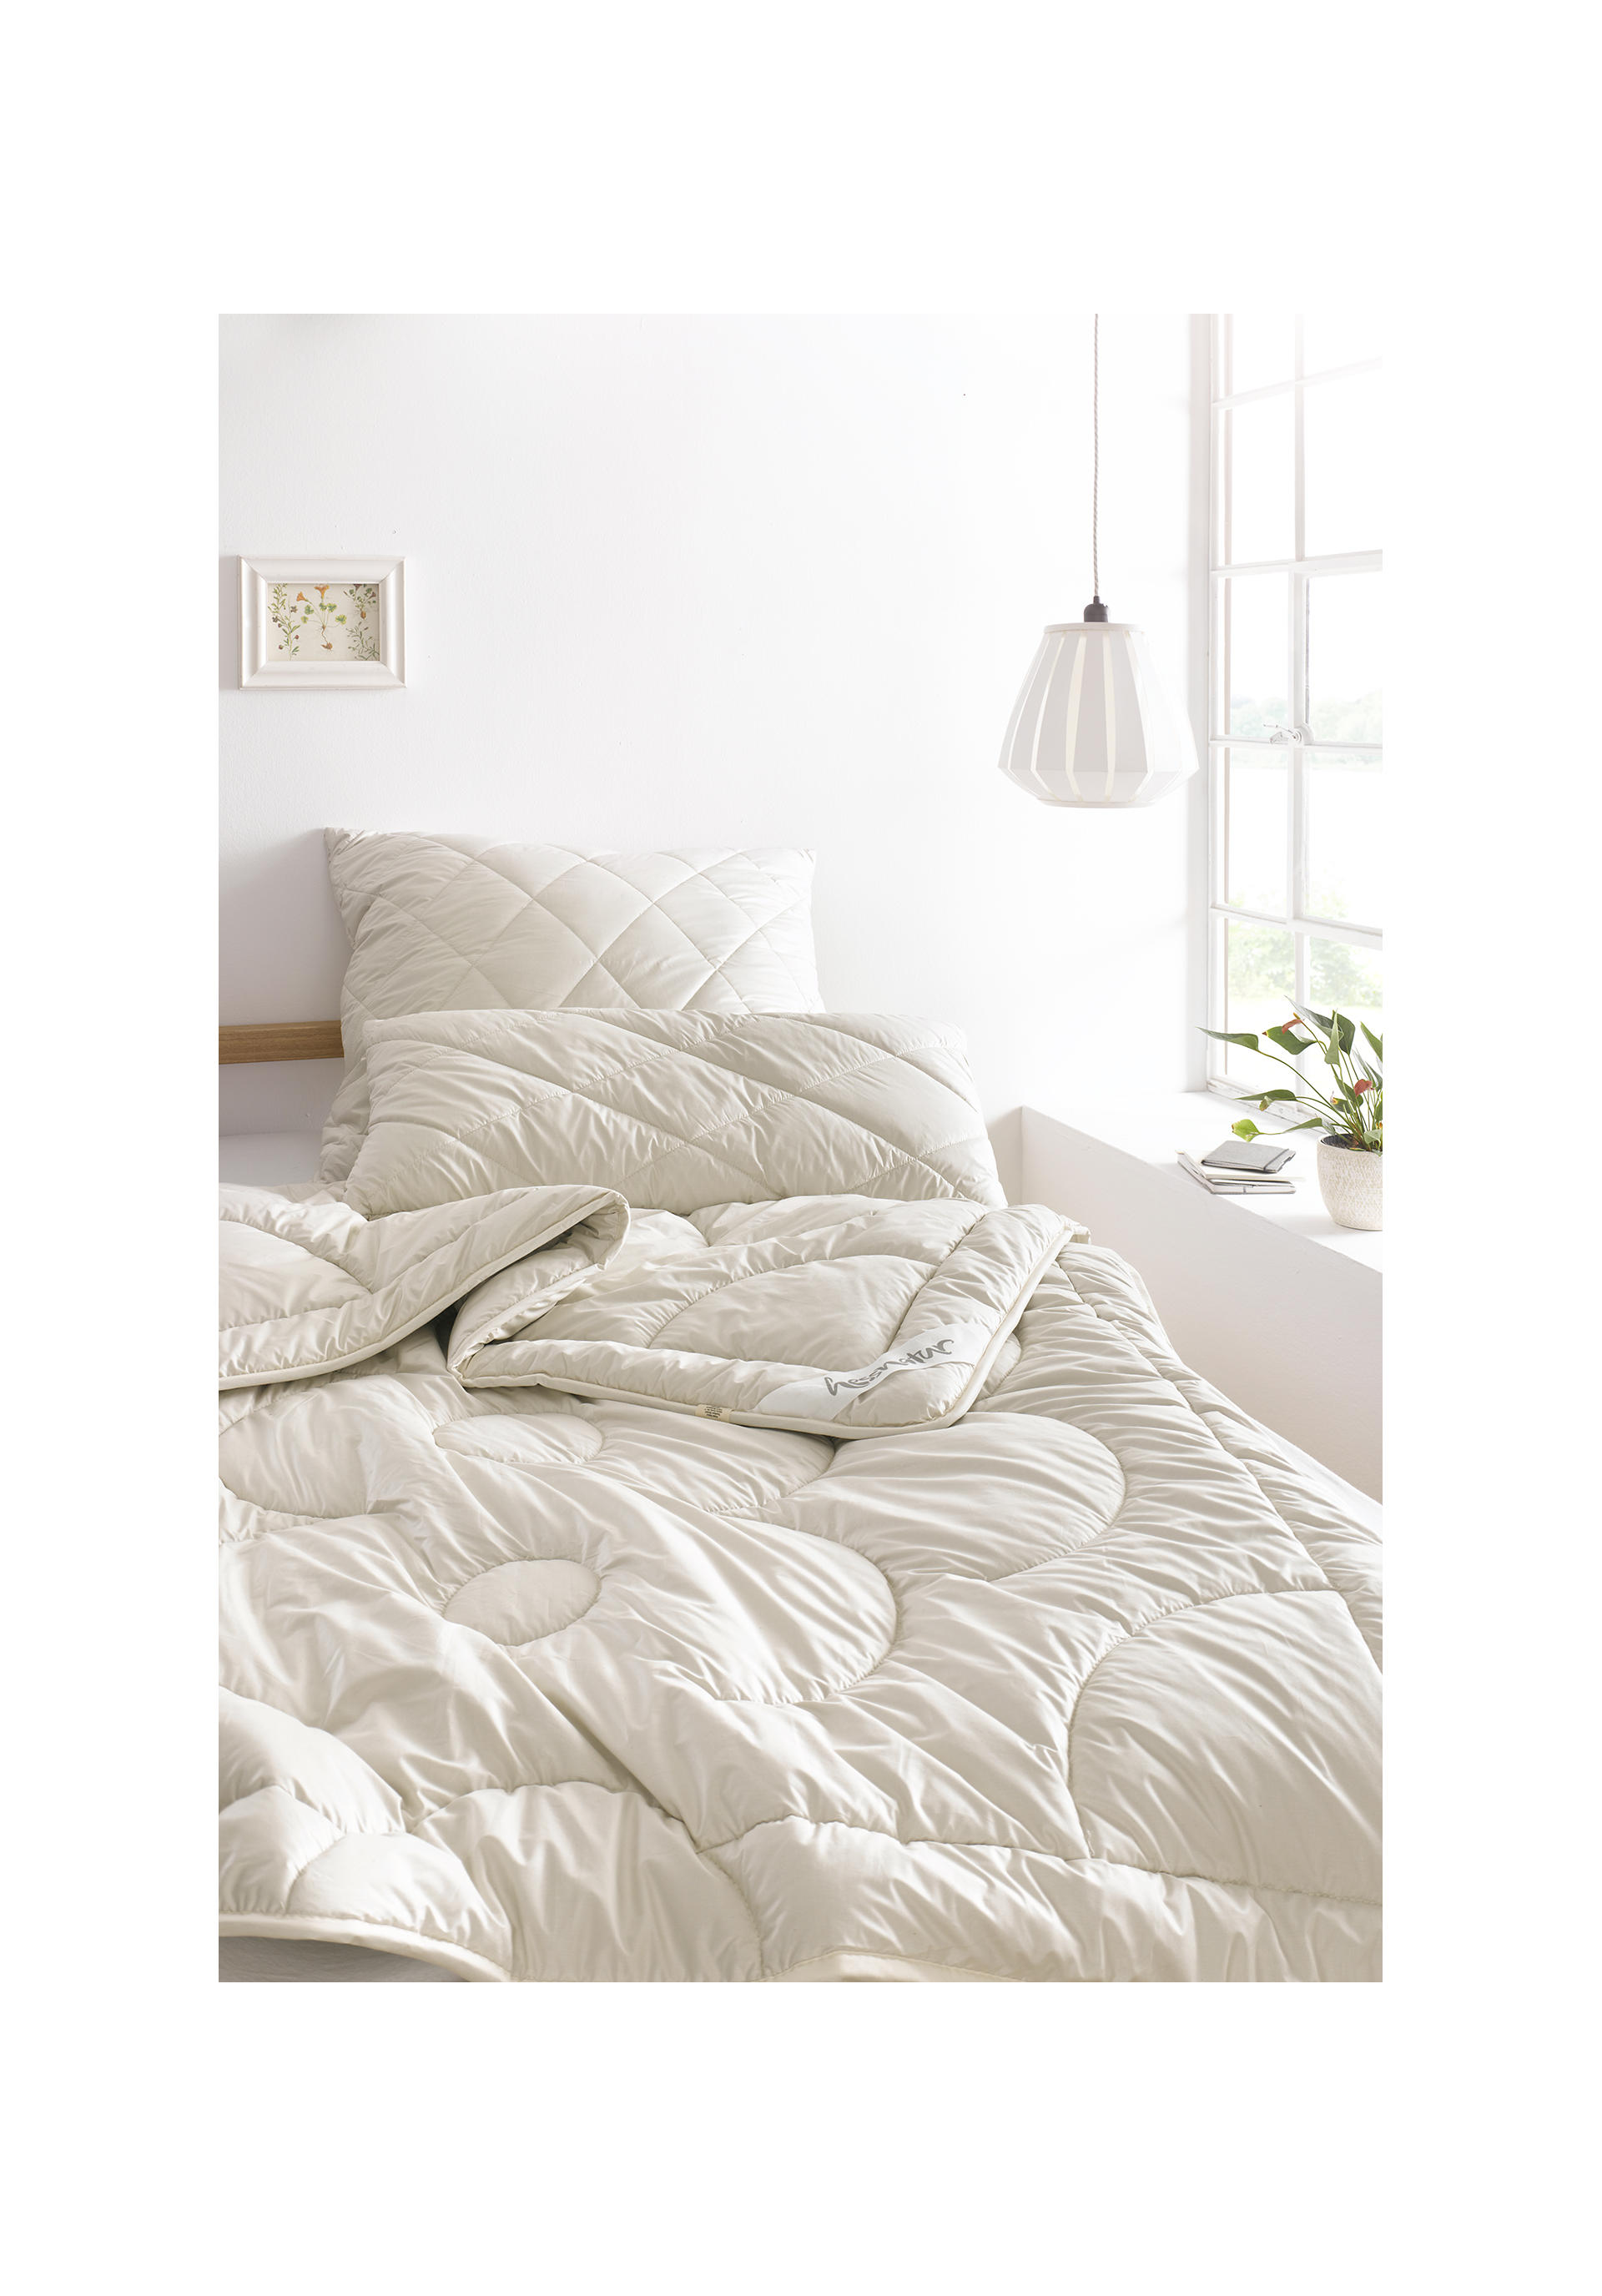 bettdecken aus yakwolle erzstef alpaka duo winter bettdecke. Black Bedroom Furniture Sets. Home Design Ideas